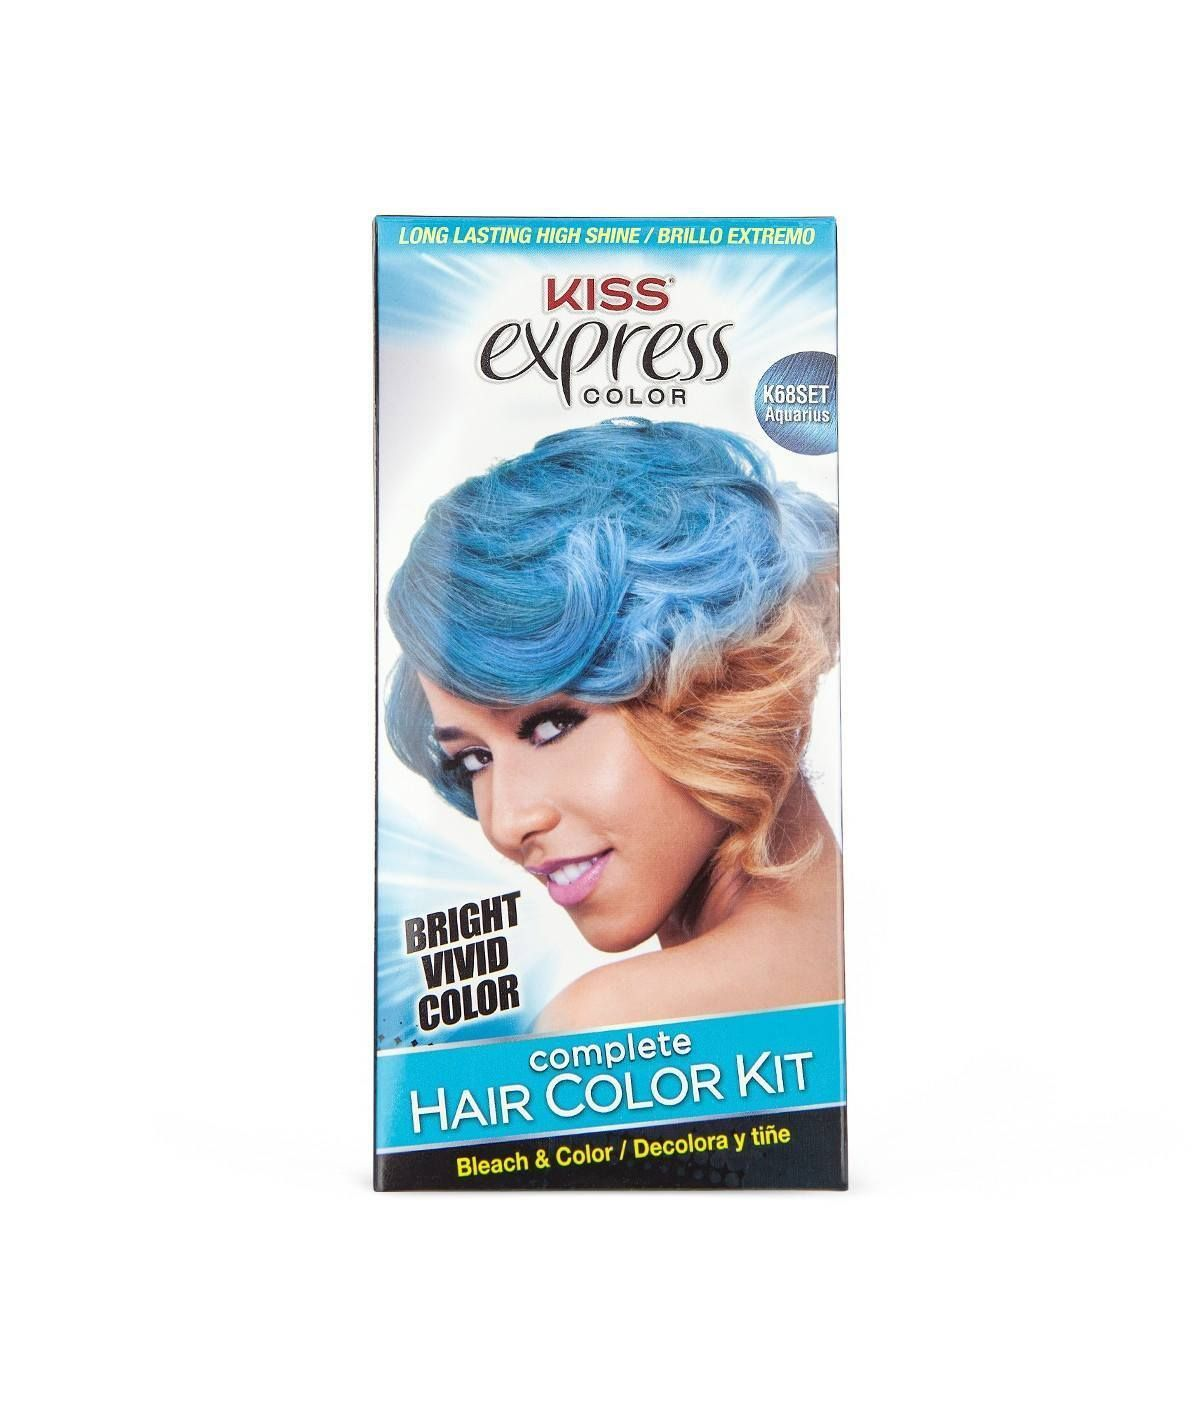 Kiss express color semipermanent hair color kit color kit semi